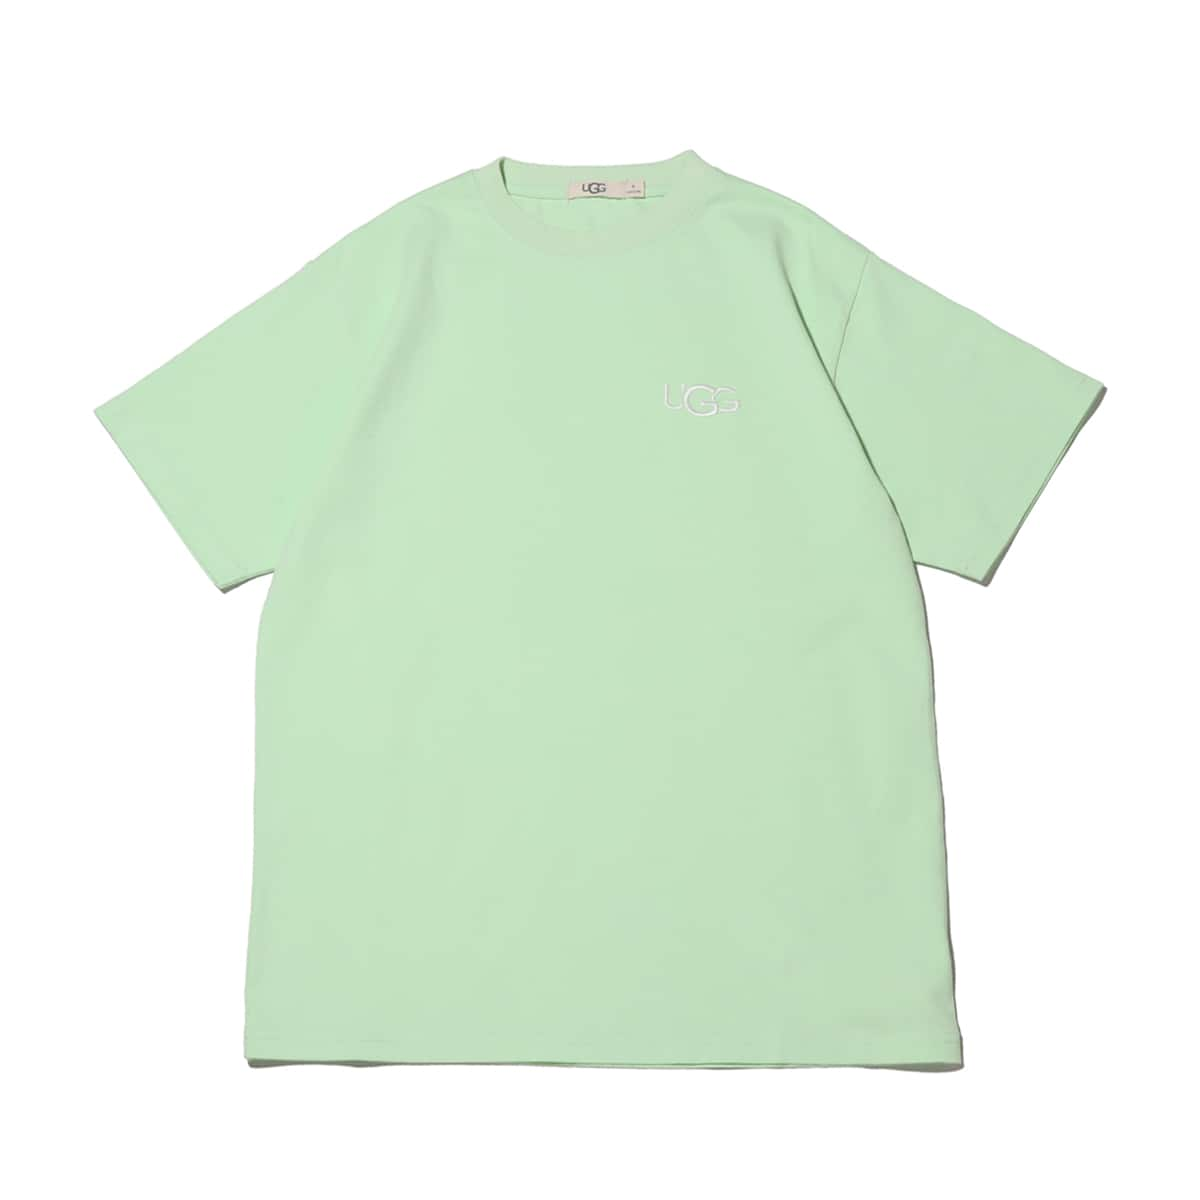 UGG ロゴ刺繍 Tシャツ GREEN 21SS-I_photo_large